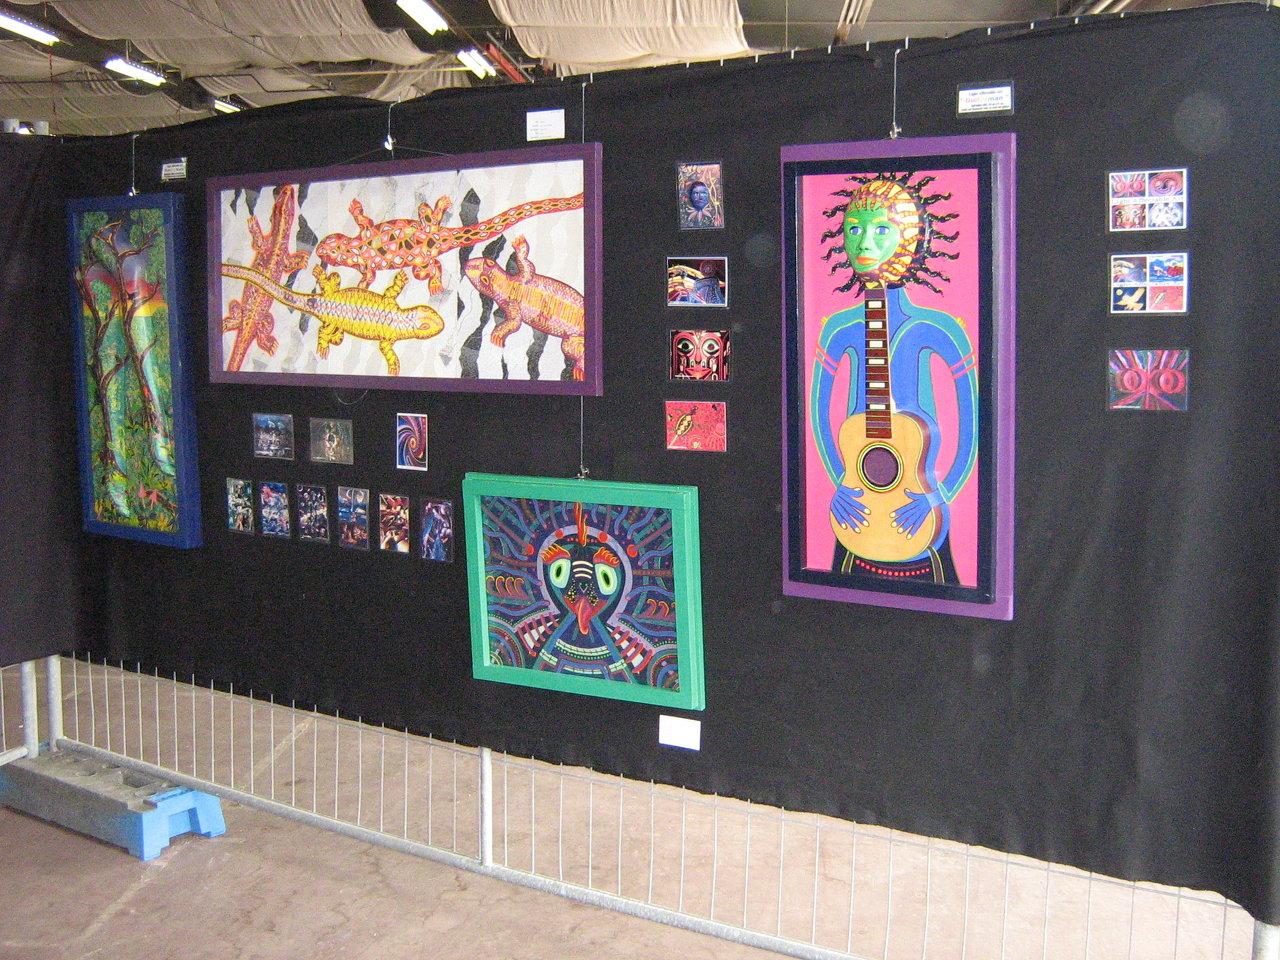 2009 Kunstfestival Woerden